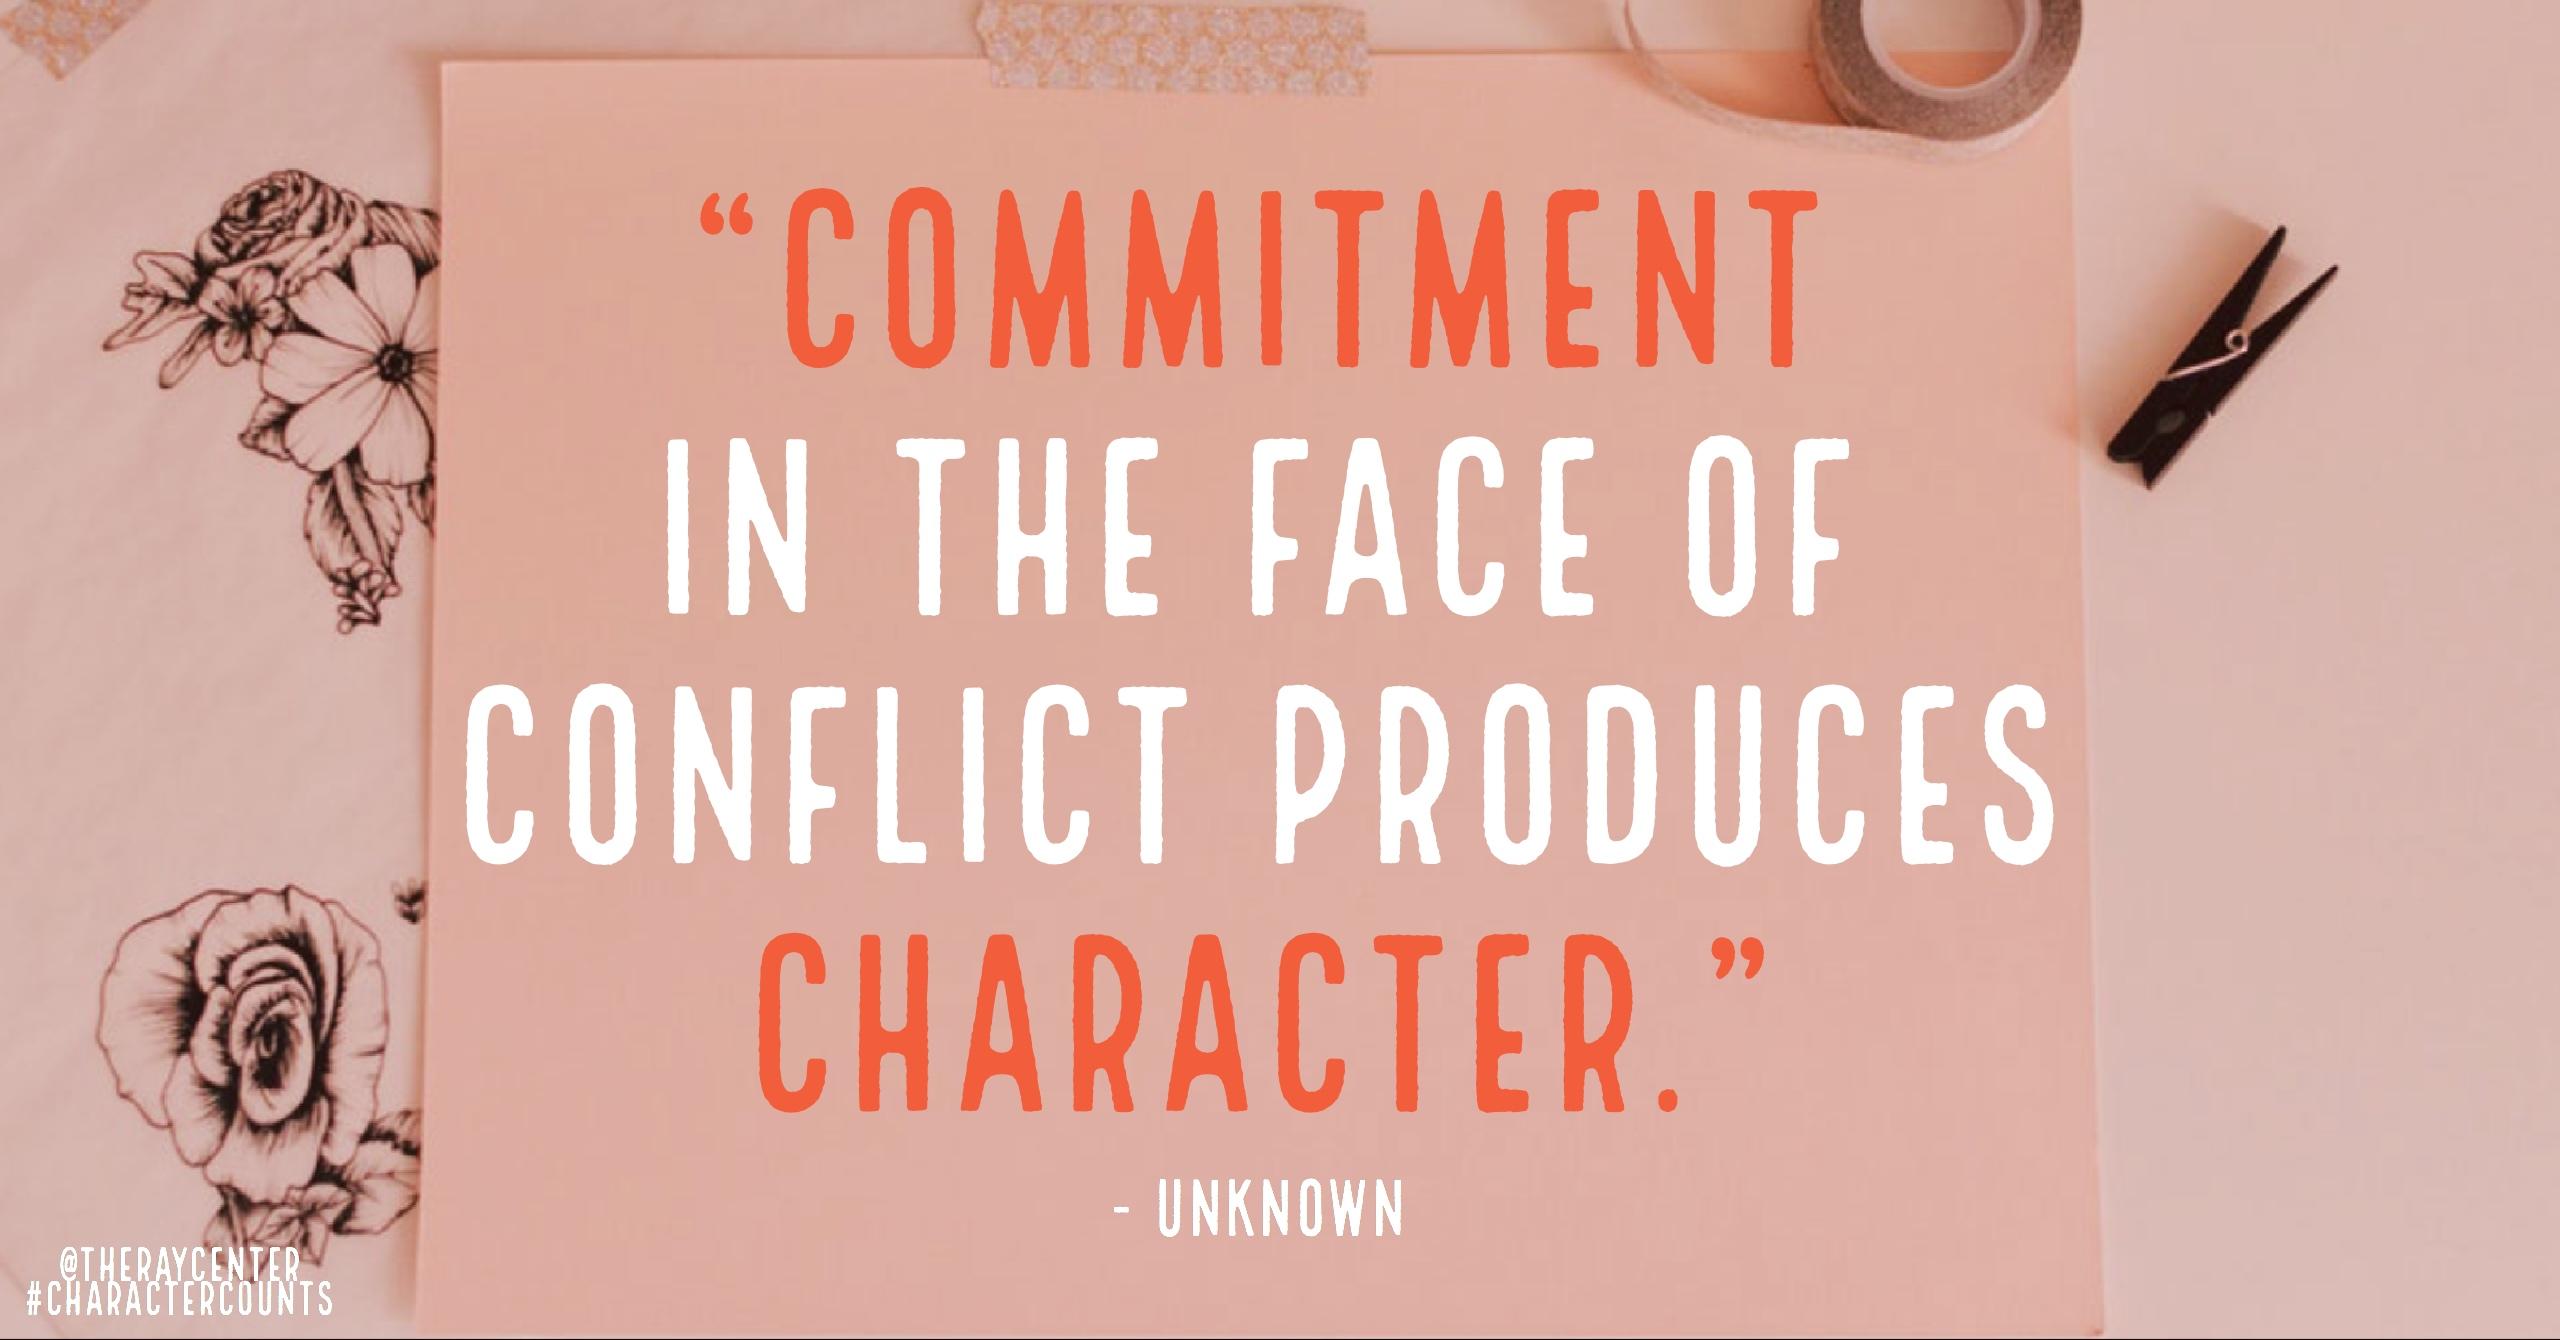 @TheRayCenter #CharacterCounts